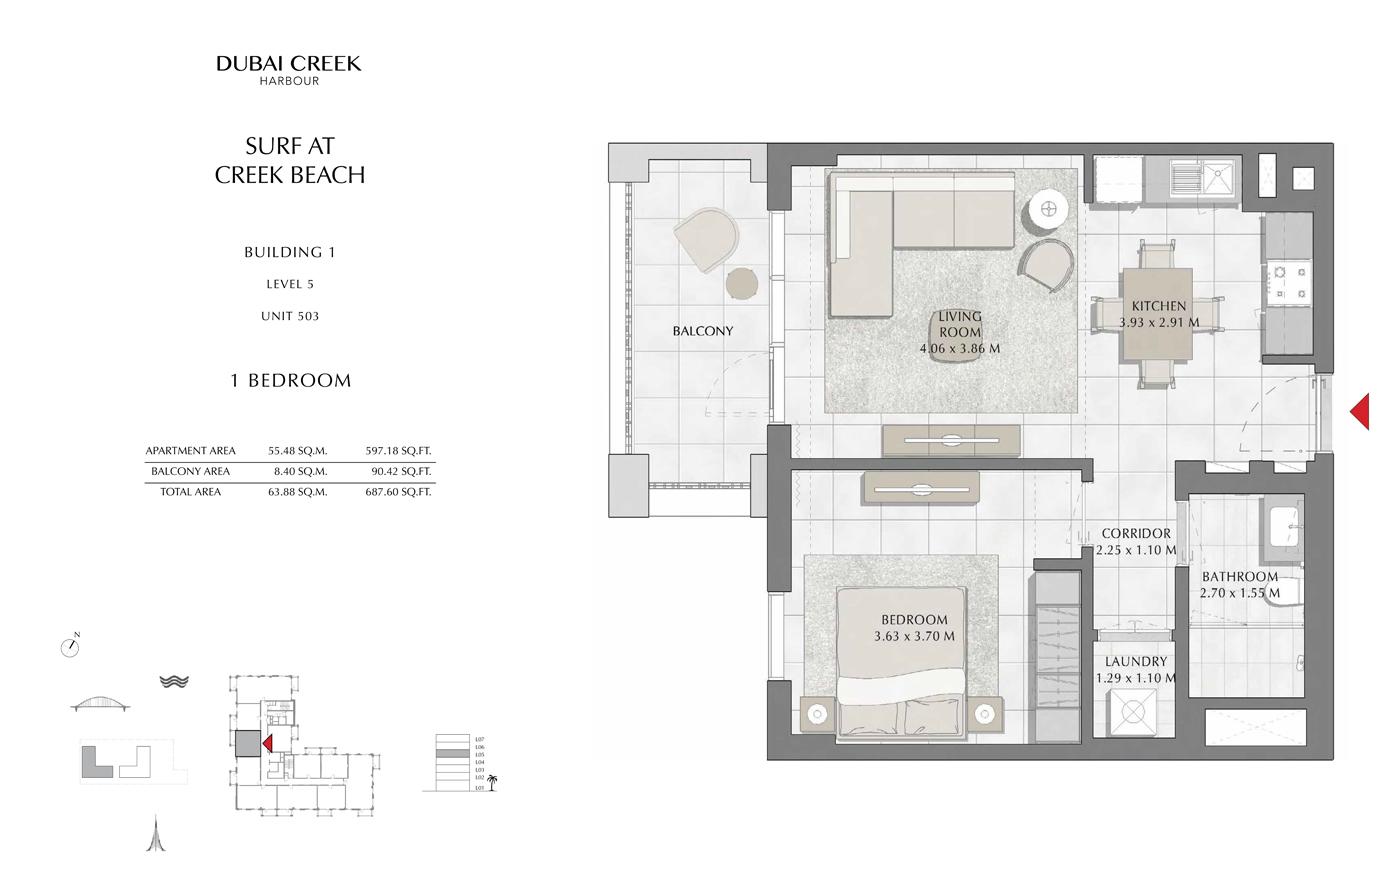 Building 1, 1 Bedroom, Level 5, Size 687 Sq Ft